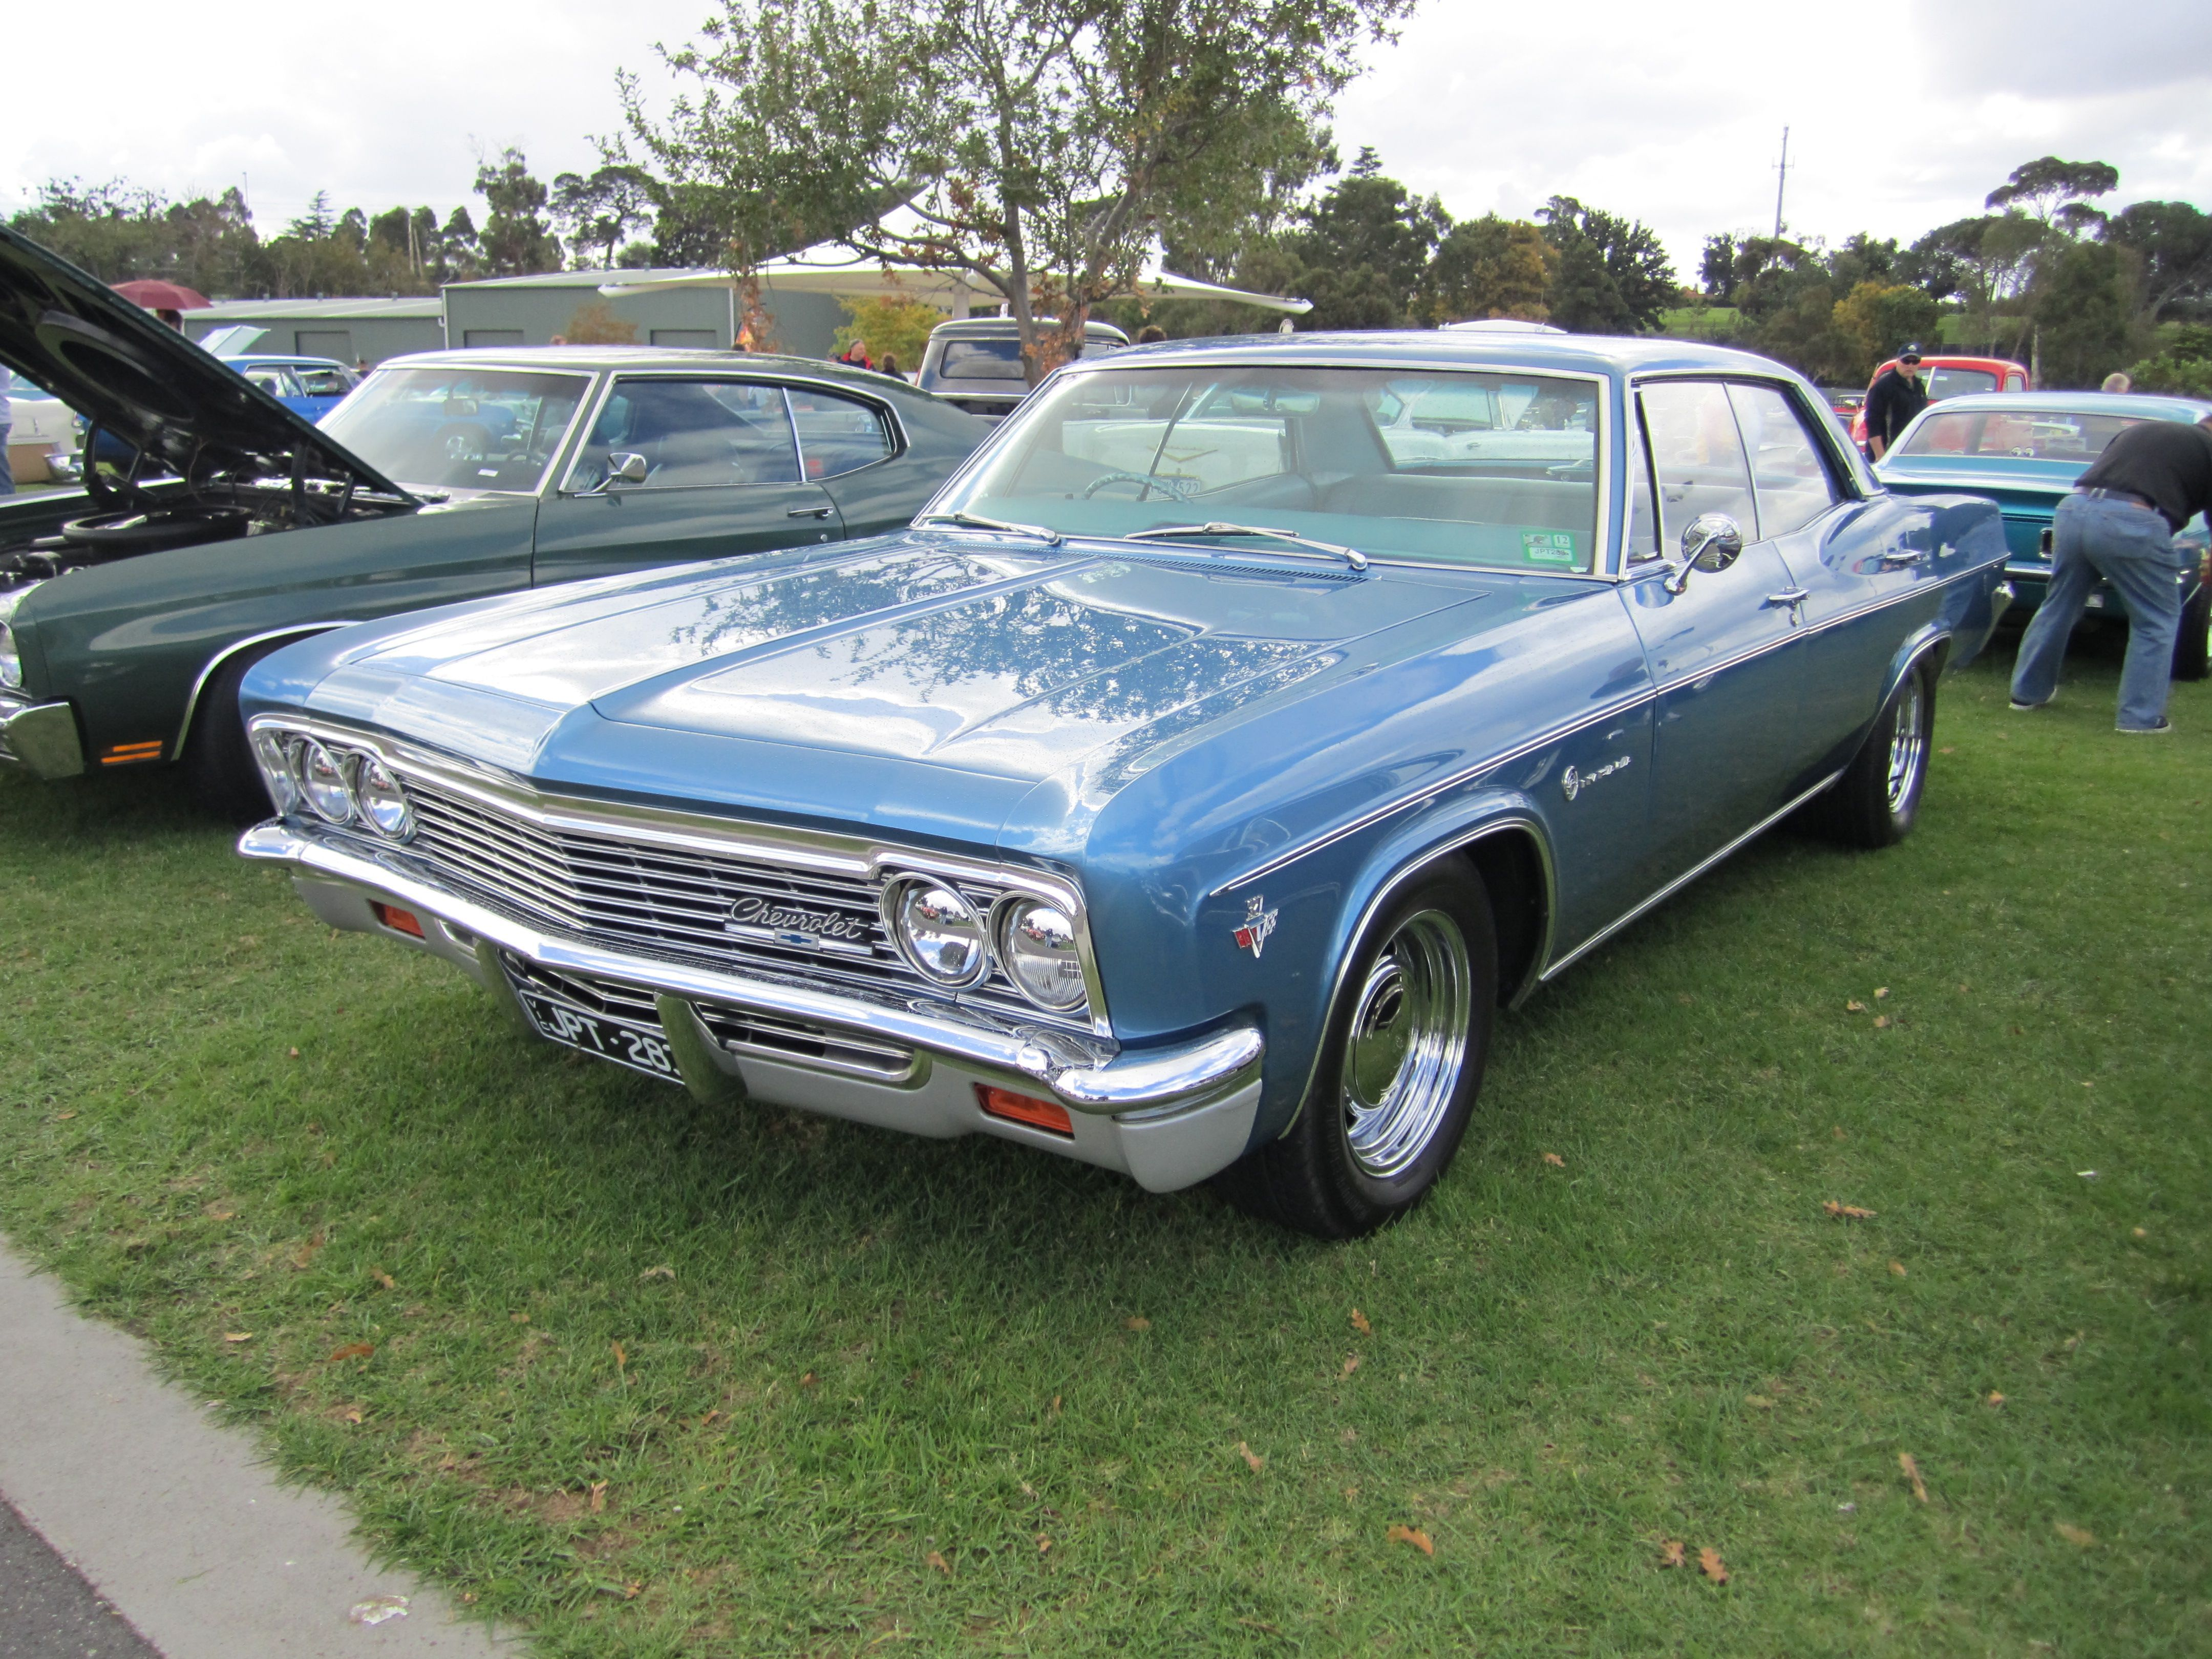 1966 Chevy Impala For Sale File 1966 Chevrolet Impala 4 Door Hardtop Wikimedia Commons